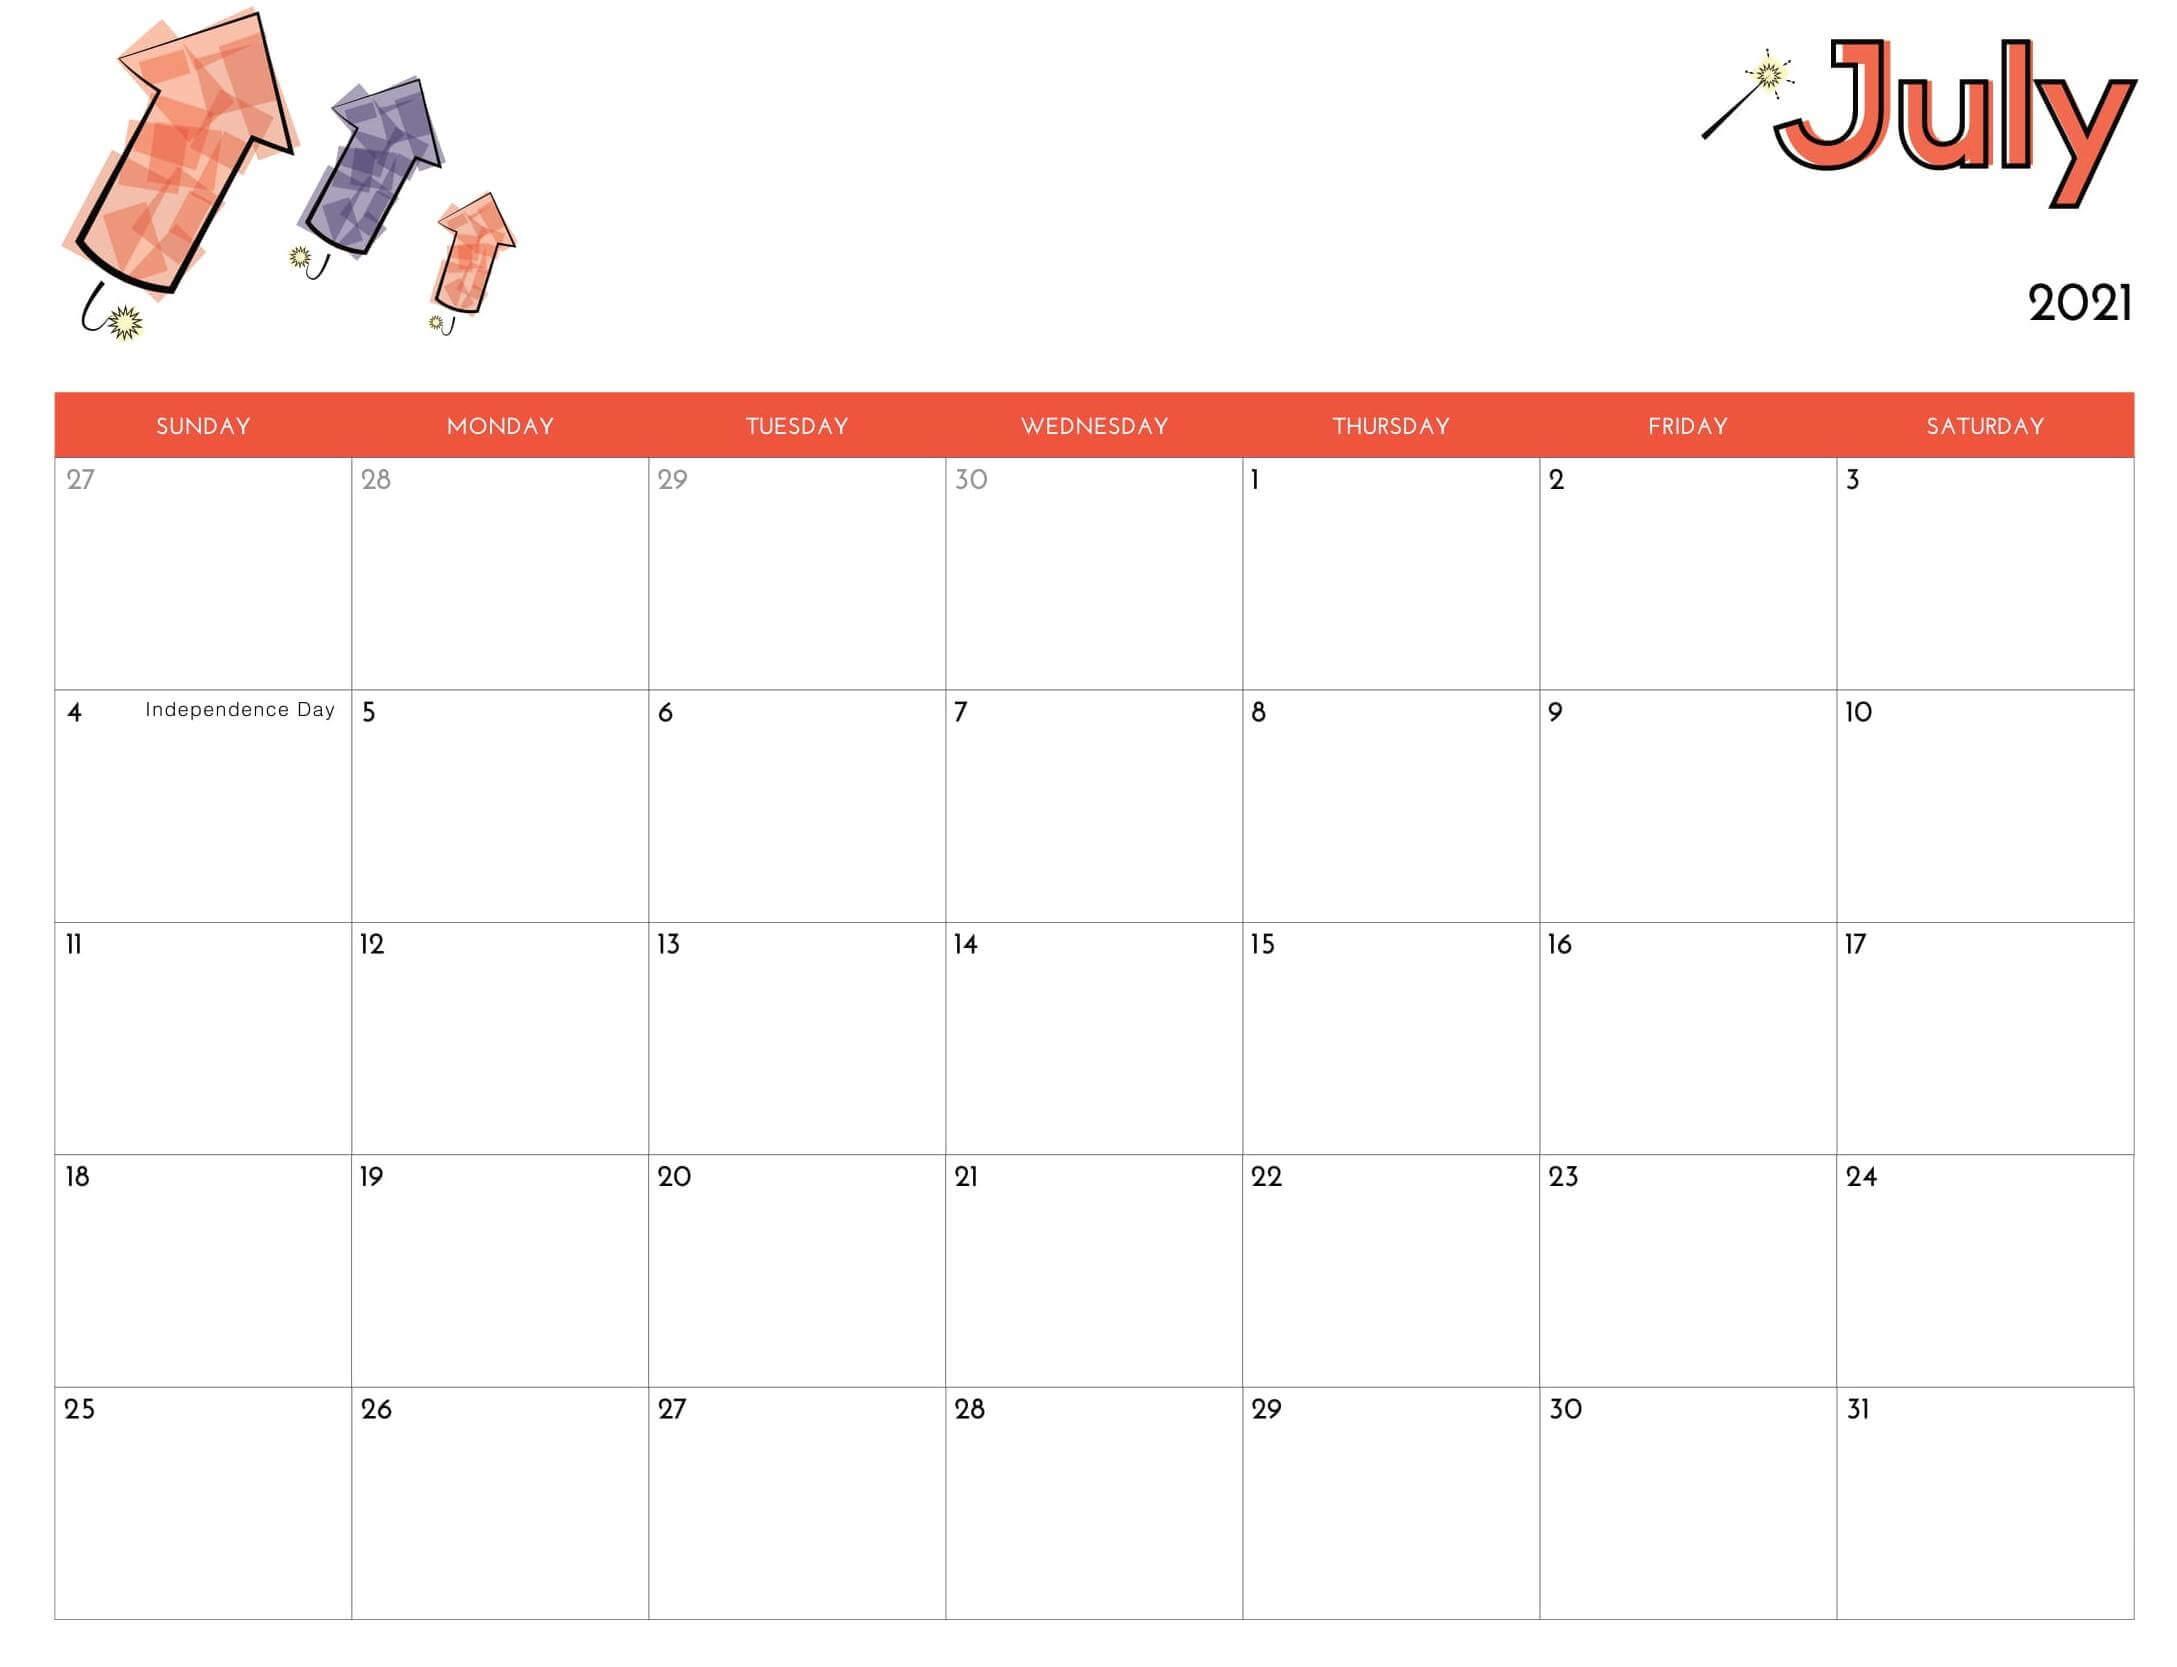 July 2021 Fillable Calendar